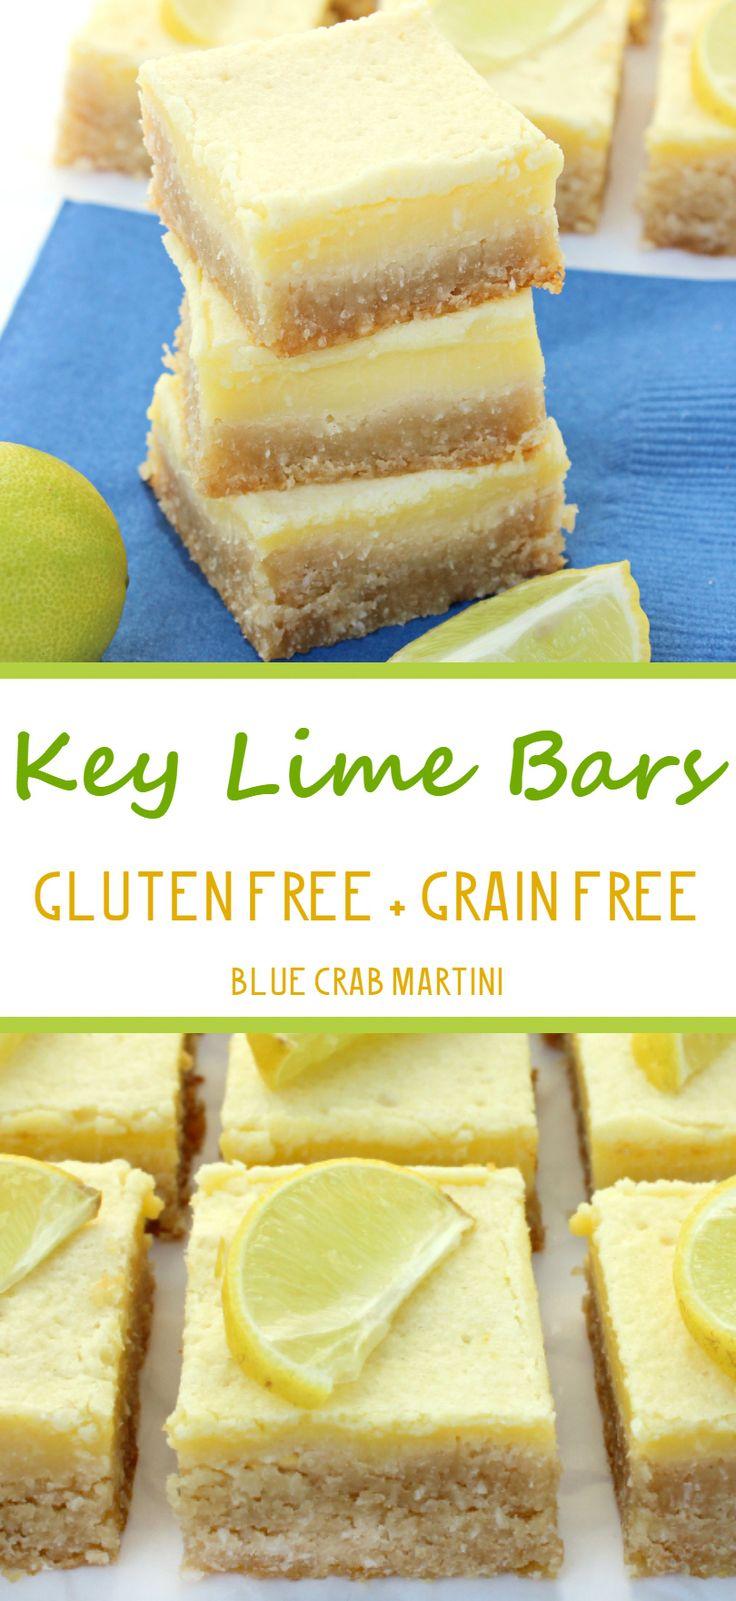 Key Lime Bars that are gluten free grain free contain no refined sugar! Plus…